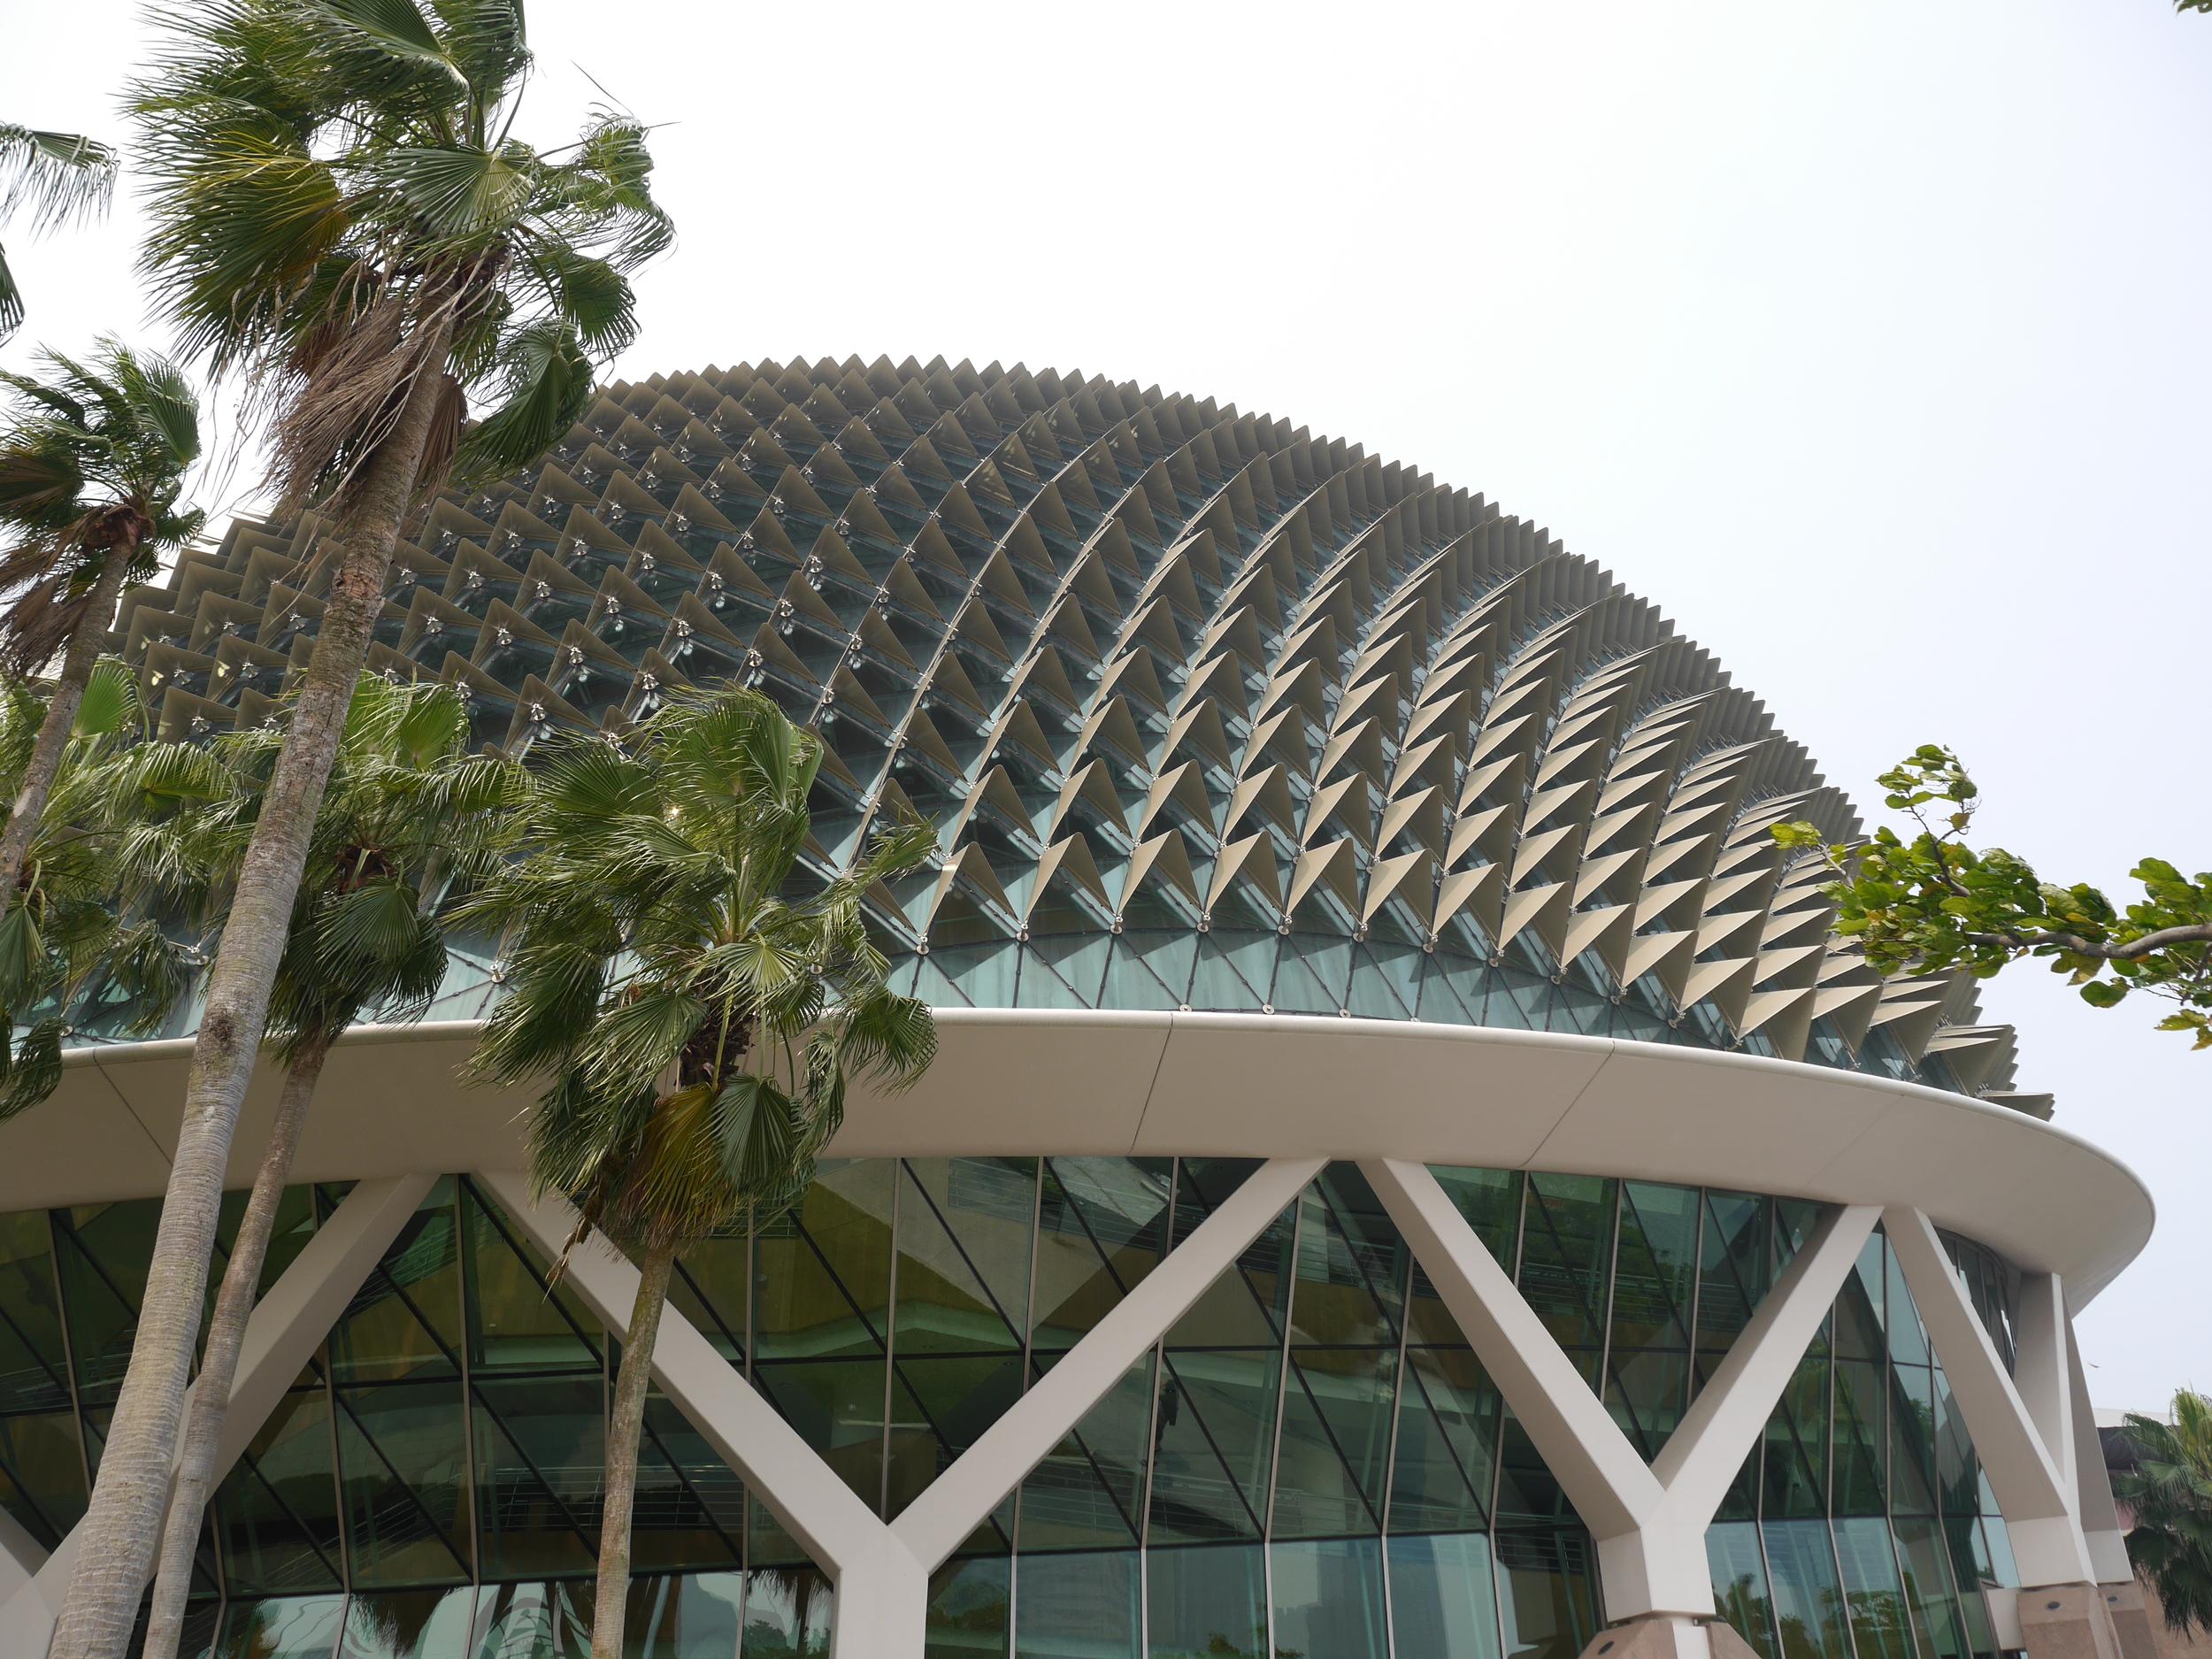 The Esplanade - Theatres on the Bay.